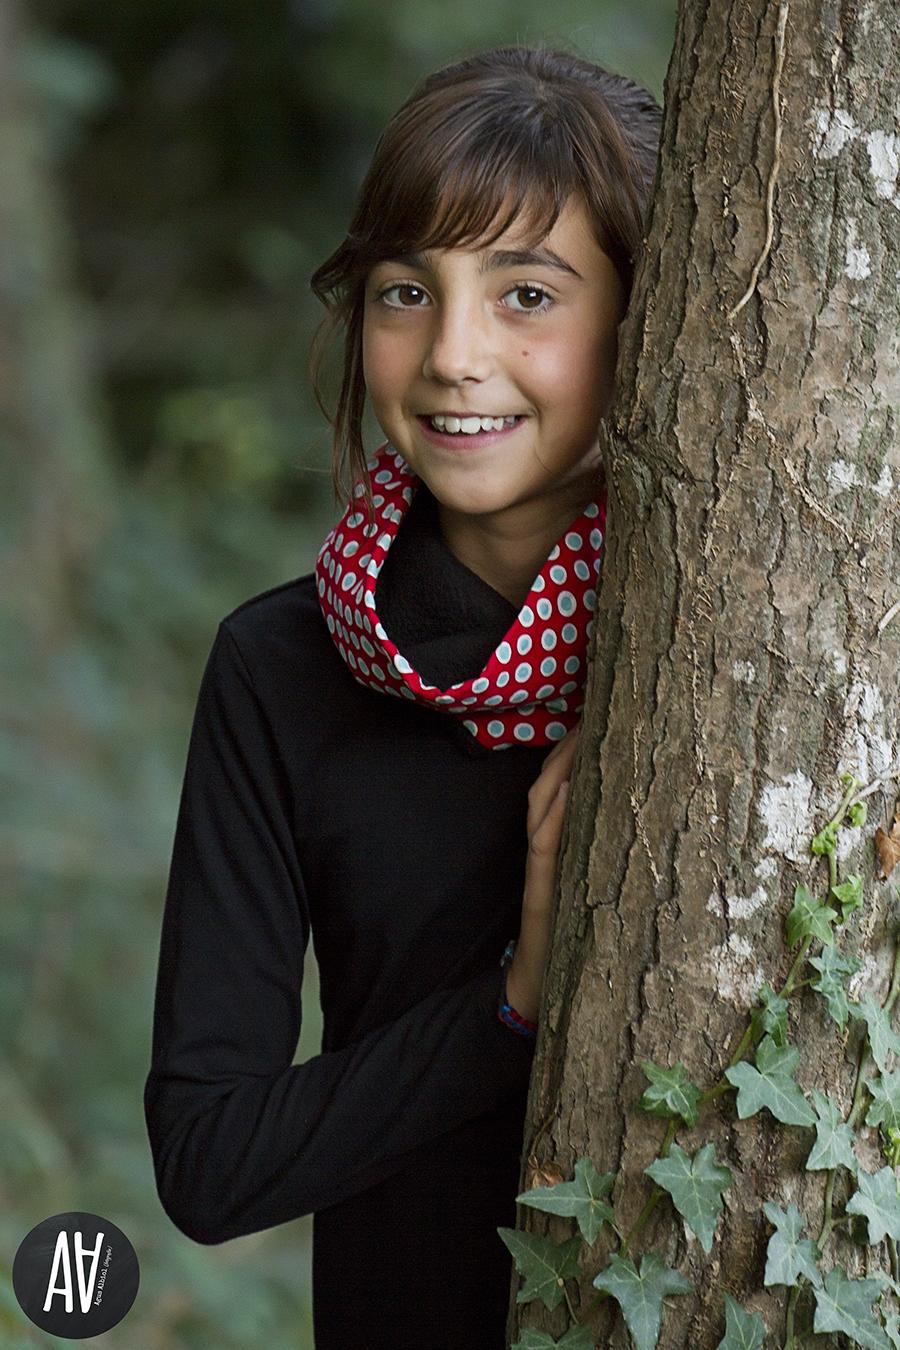 sesiones otoño niños agus albiol fotografia sesiones exterior barcelona tona fotografa de niños.03